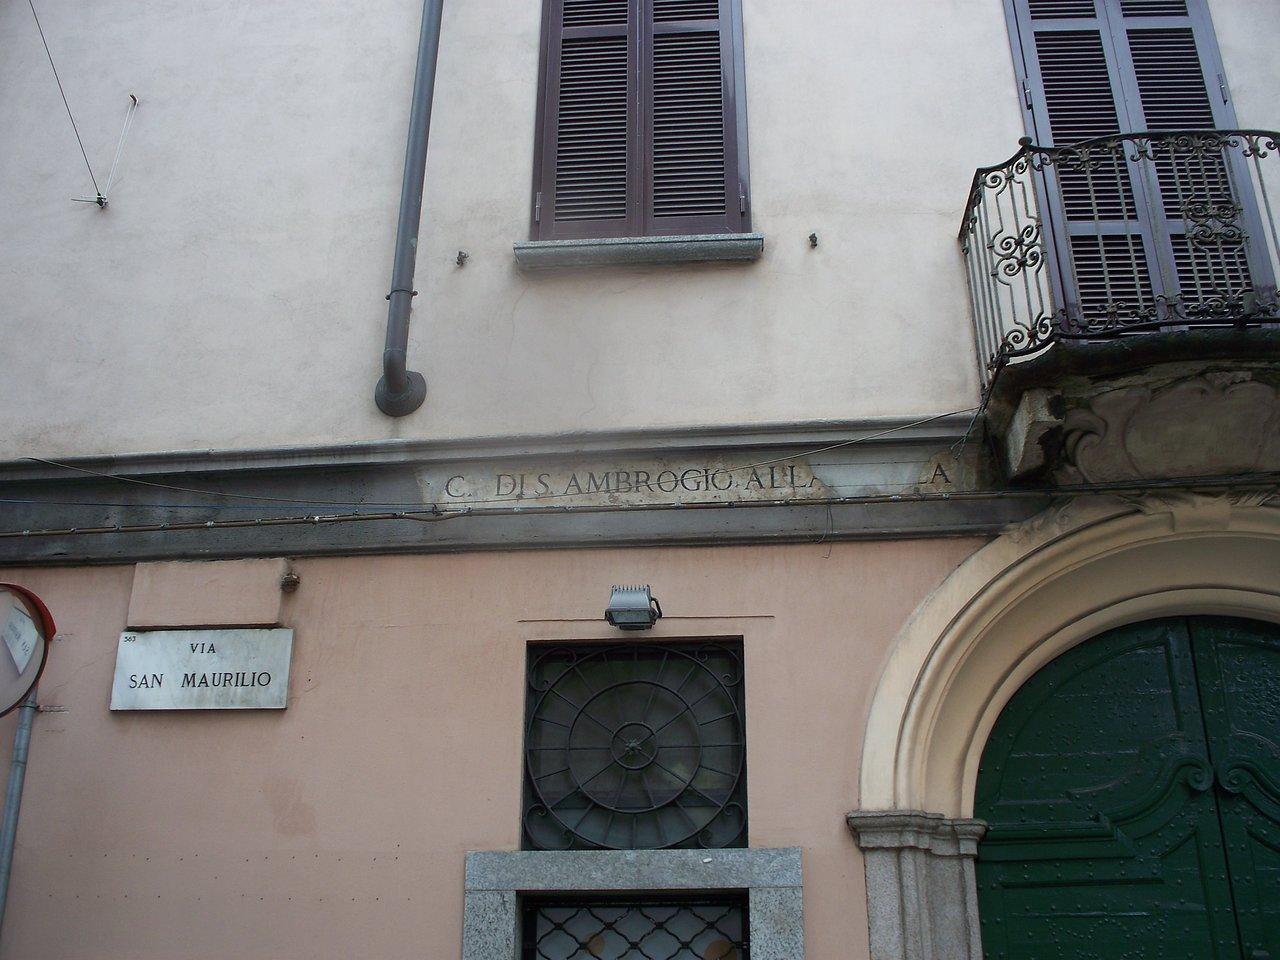 Via San Maurilio Milano palazzo via san maurilio 18 (milan) - all you need to know